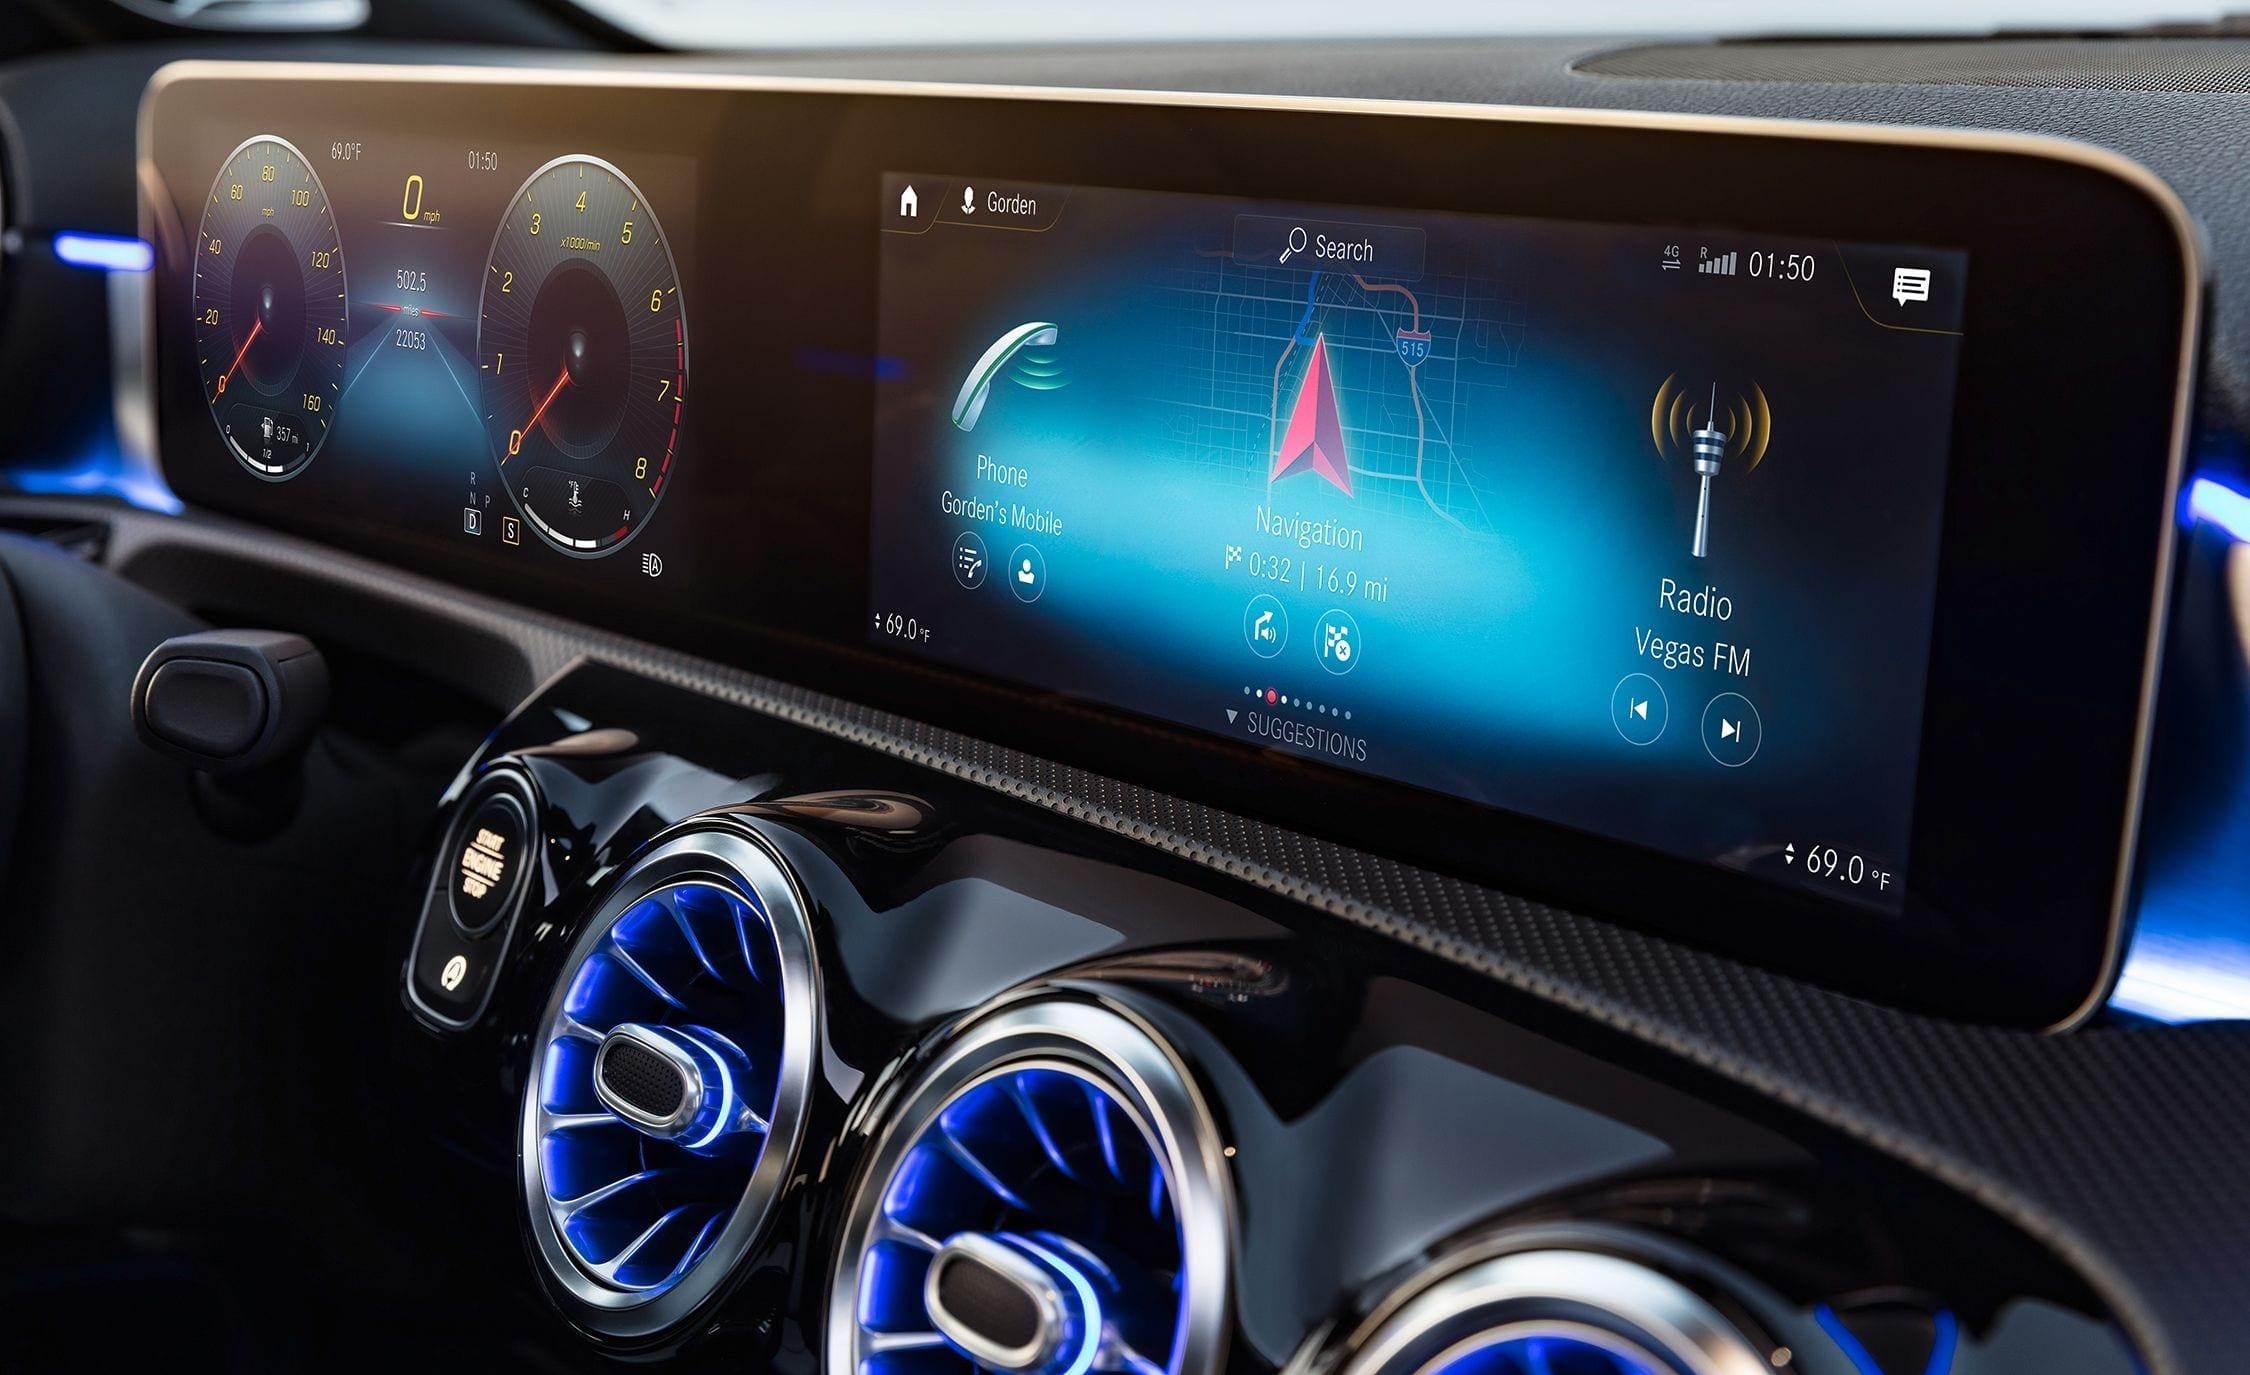 الآن تستطيع ان تتحدث مع سيارتك مع نظام MBUX من مرسيدس